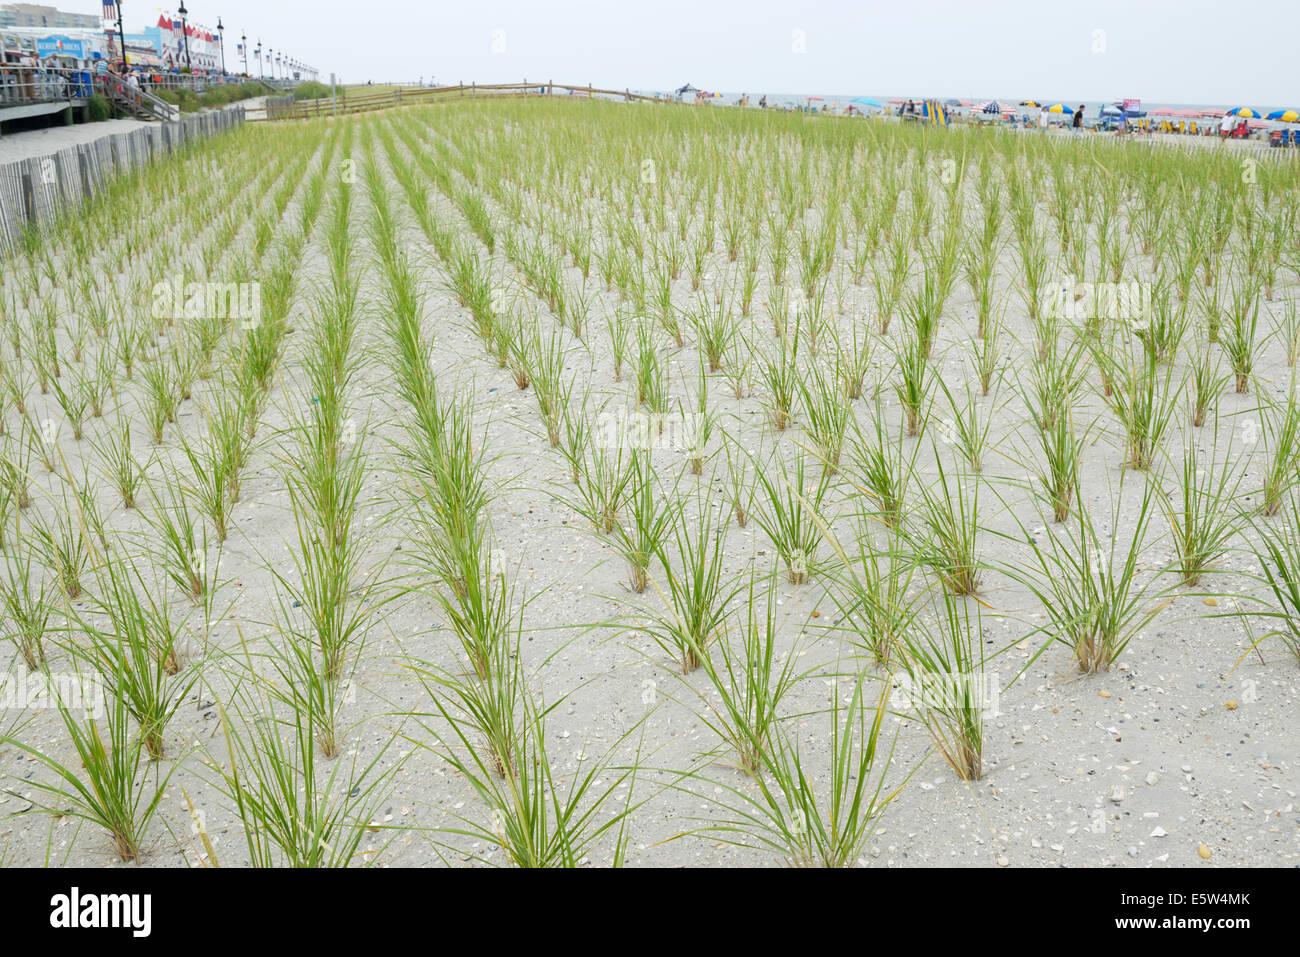 Cape American beach grass, Ammophila breviligulata, planted to stabilize the dunes and prevent beach erosion - Stock Image